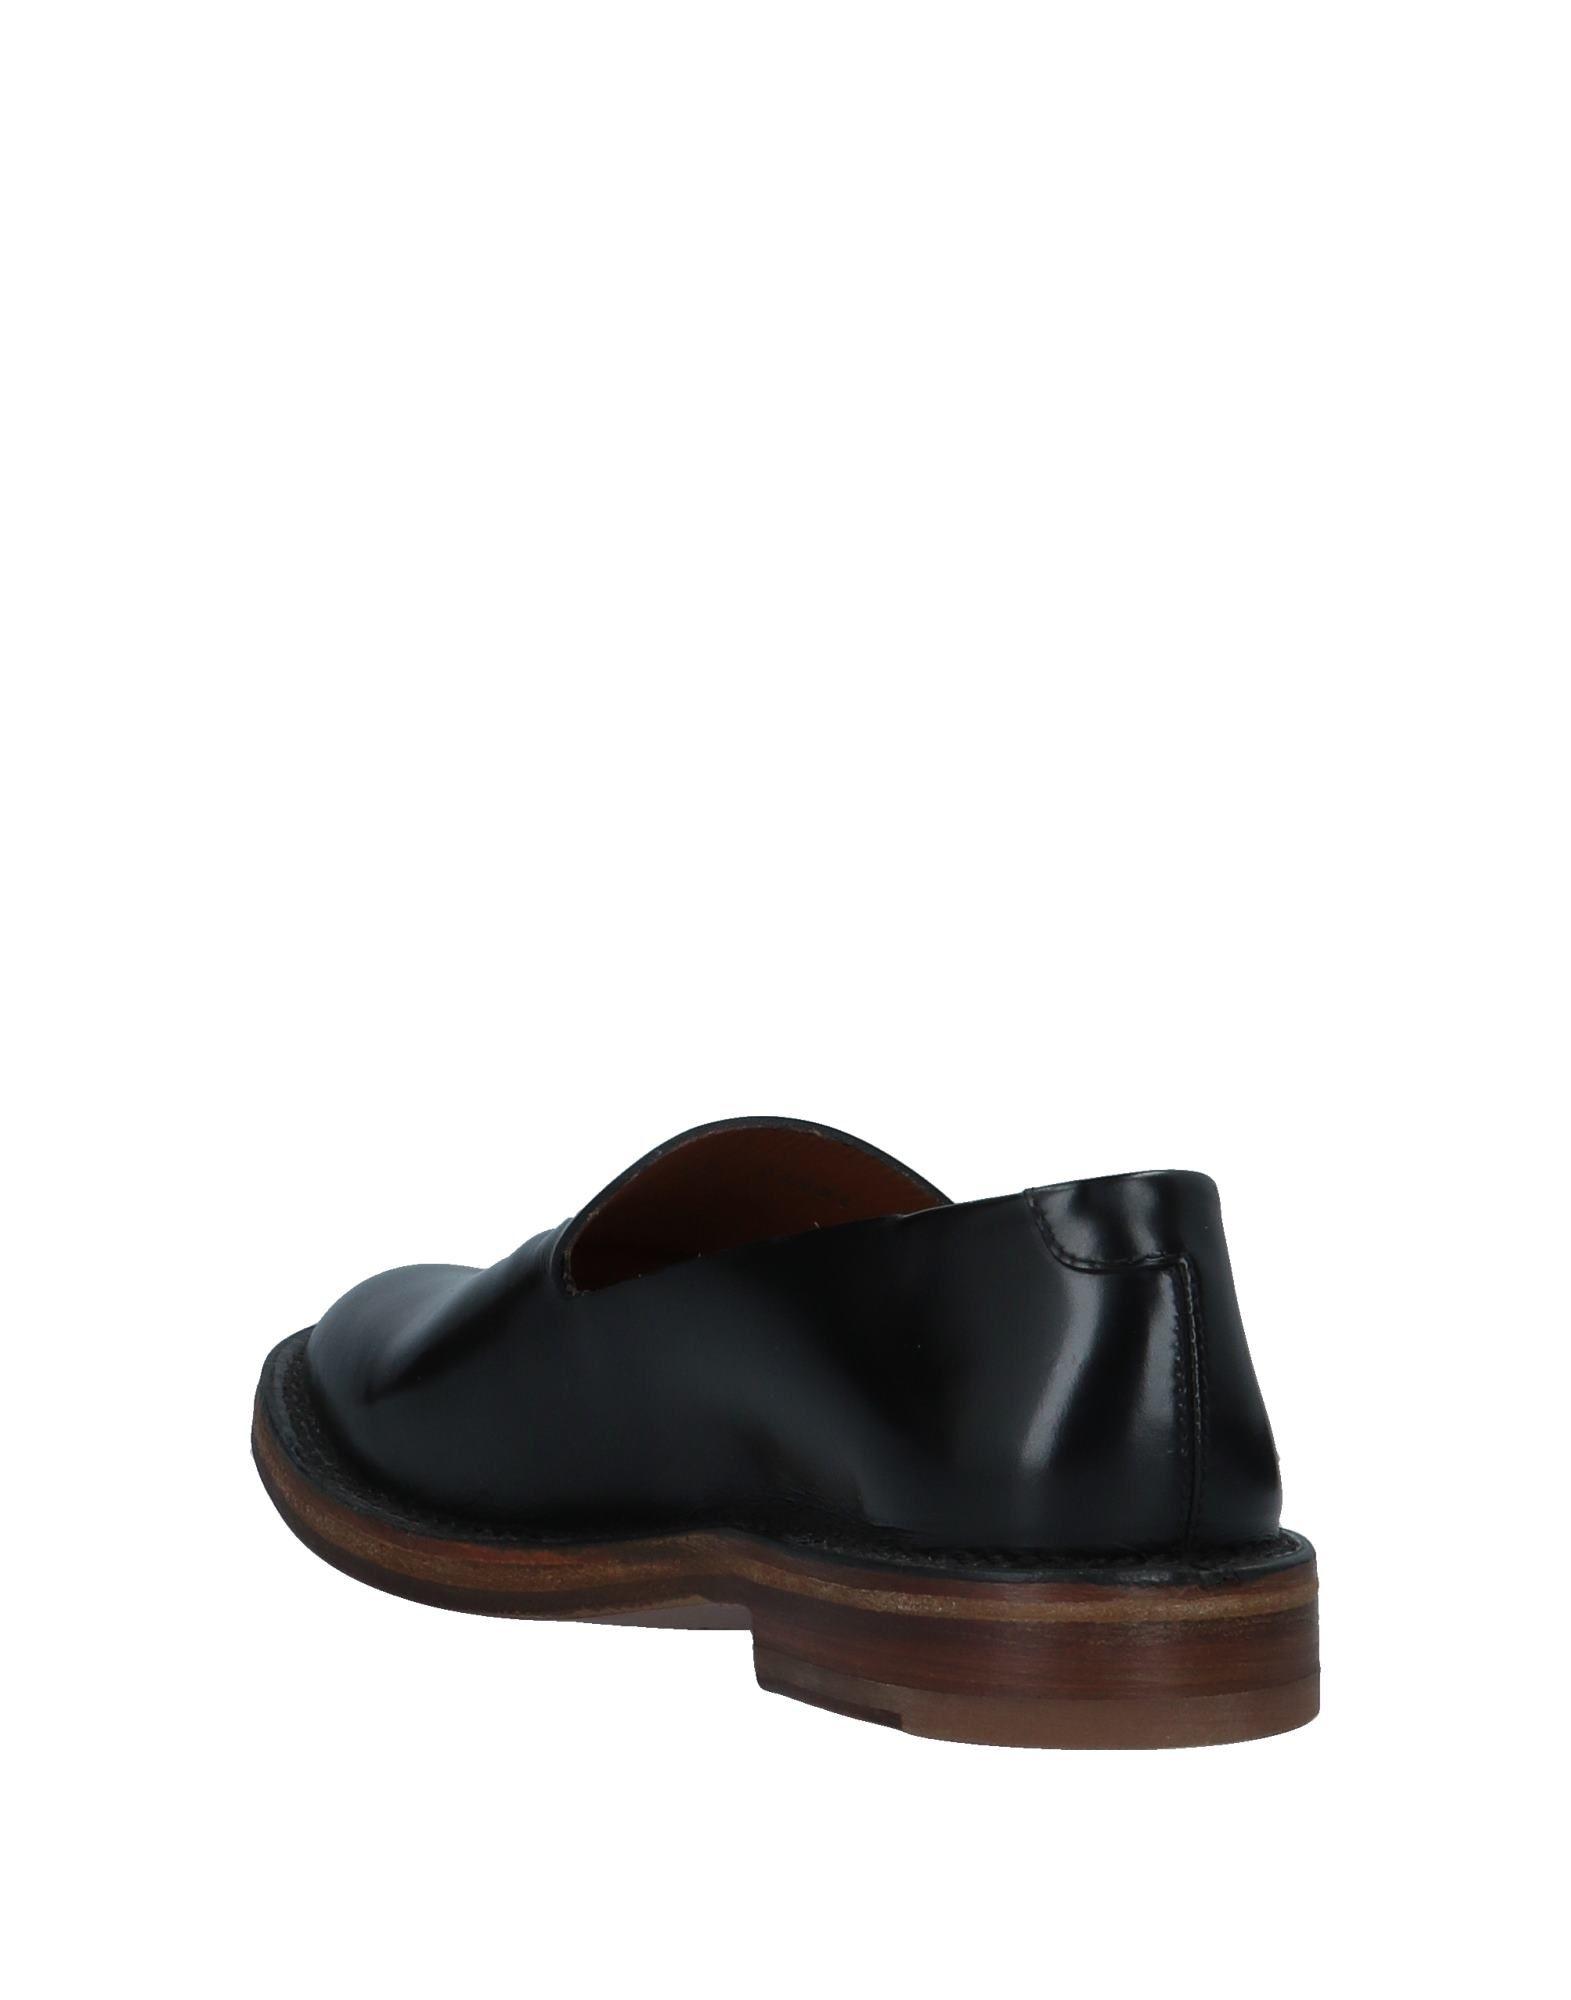 Buttero® Mokassins Herren beliebte  11173552AT Gute Qualität beliebte Herren Schuhe 93ce5d